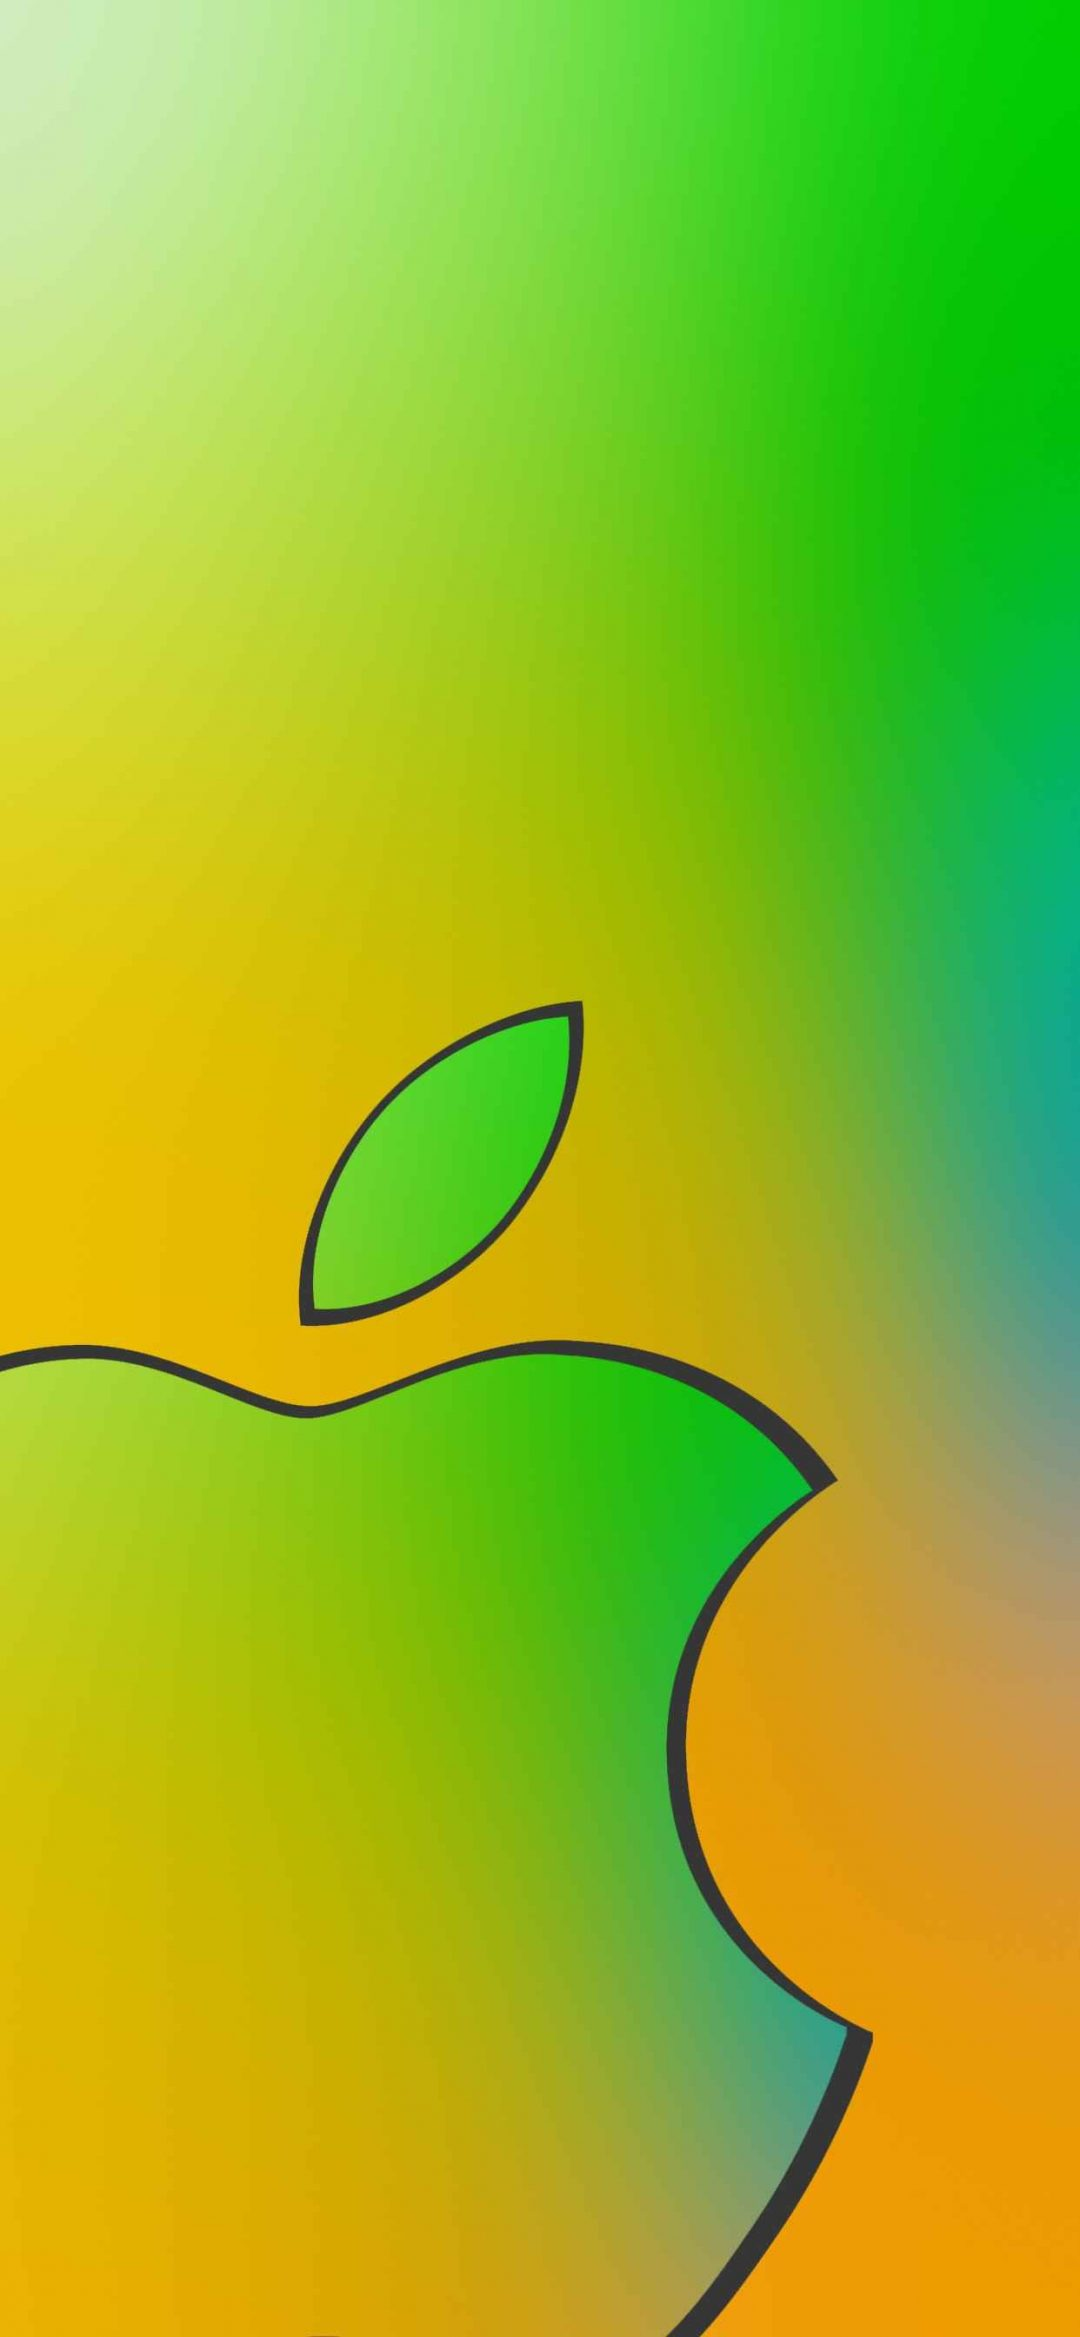 Apple card wallpapers 9 wallpapers download droidviews - Original apple logo wallpaper ...